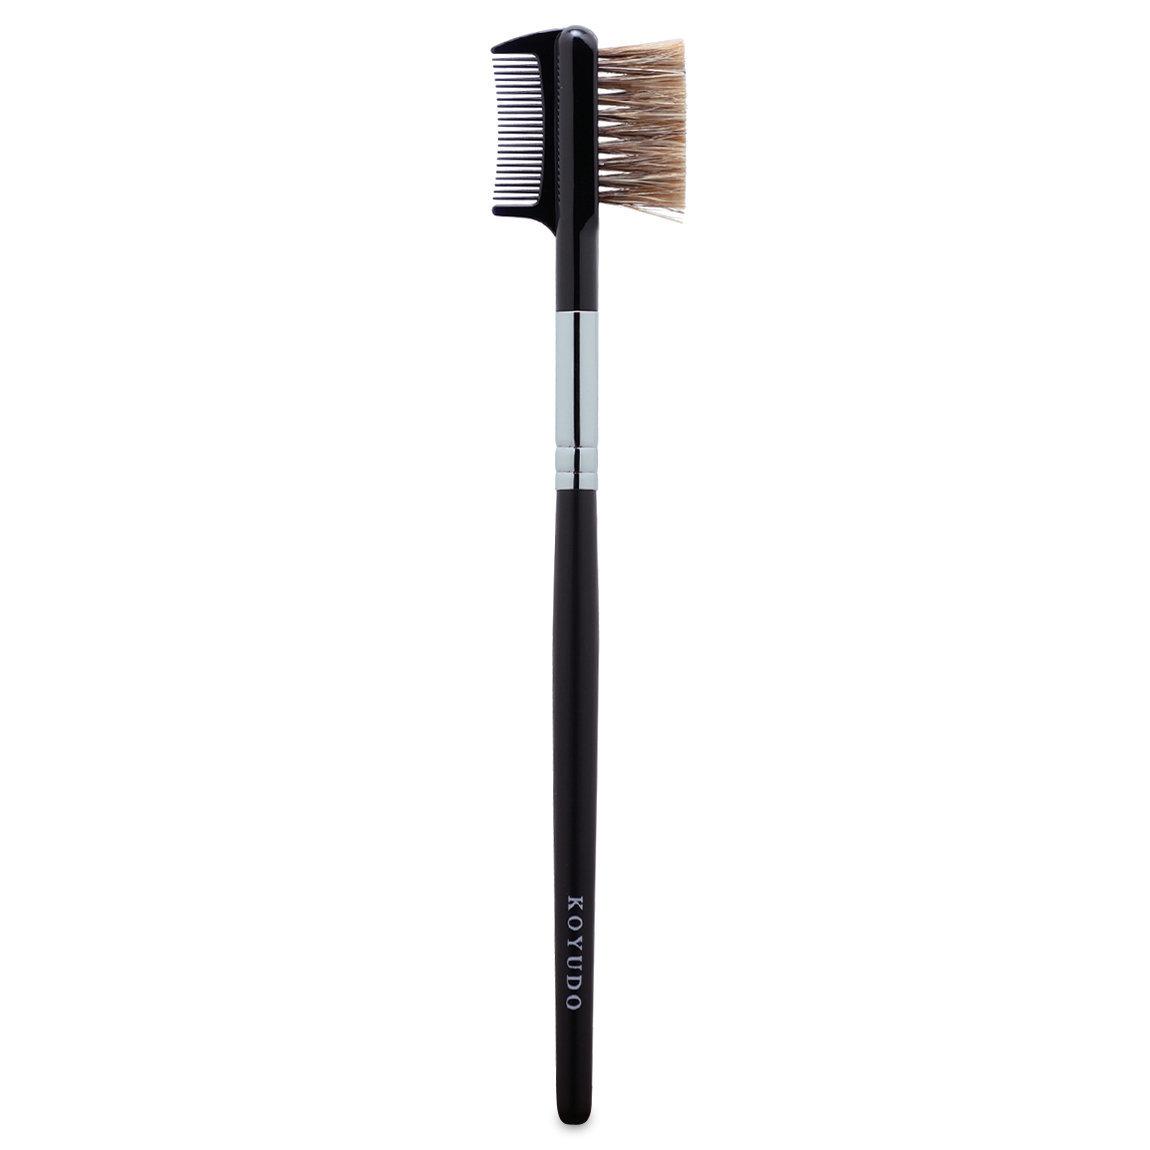 KOYUDO Casual Series C-46 Brush & Comb Black product swatch.